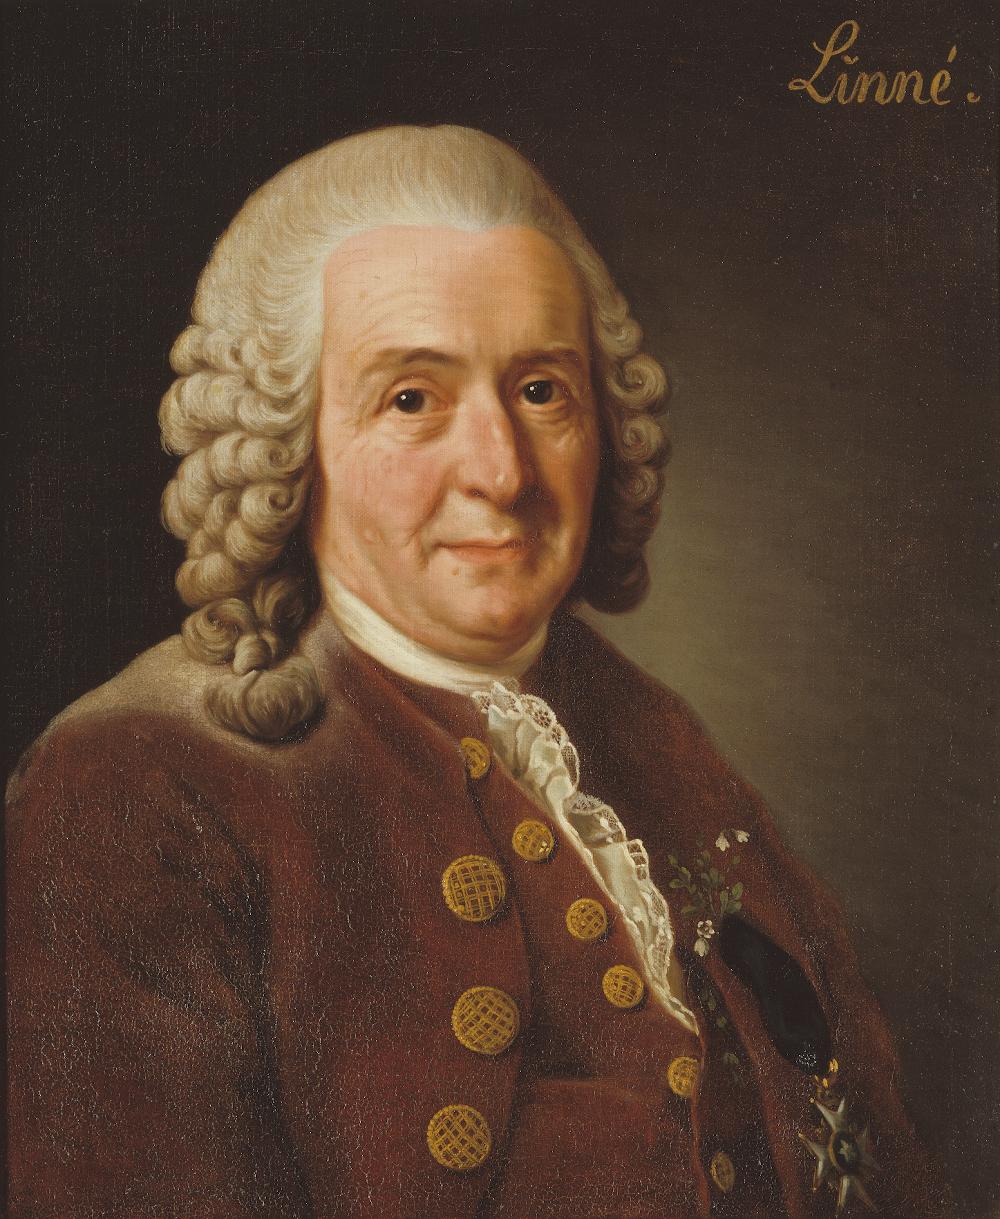 Portrait of Linnaeus (1707-1778).